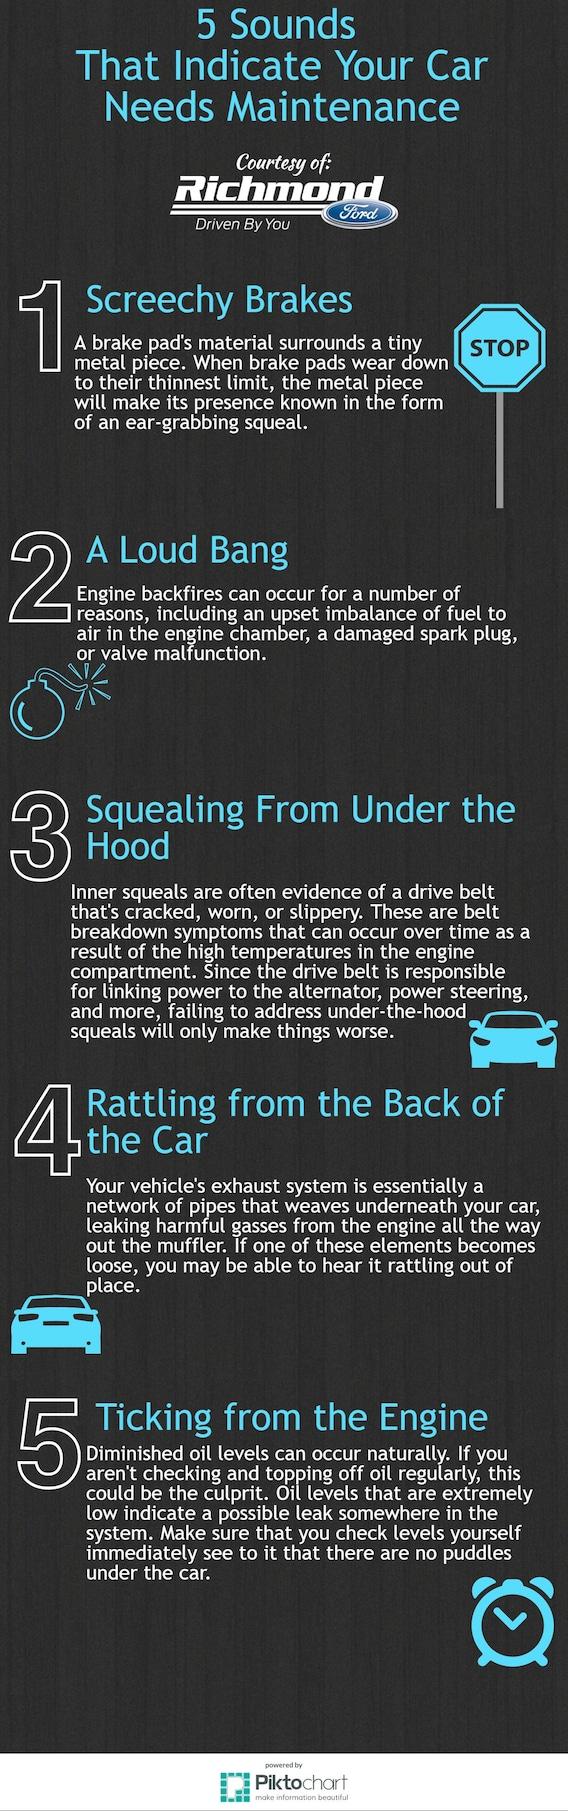 Sounds That Indicate Your Car Needs Maintenance Richmond, VA